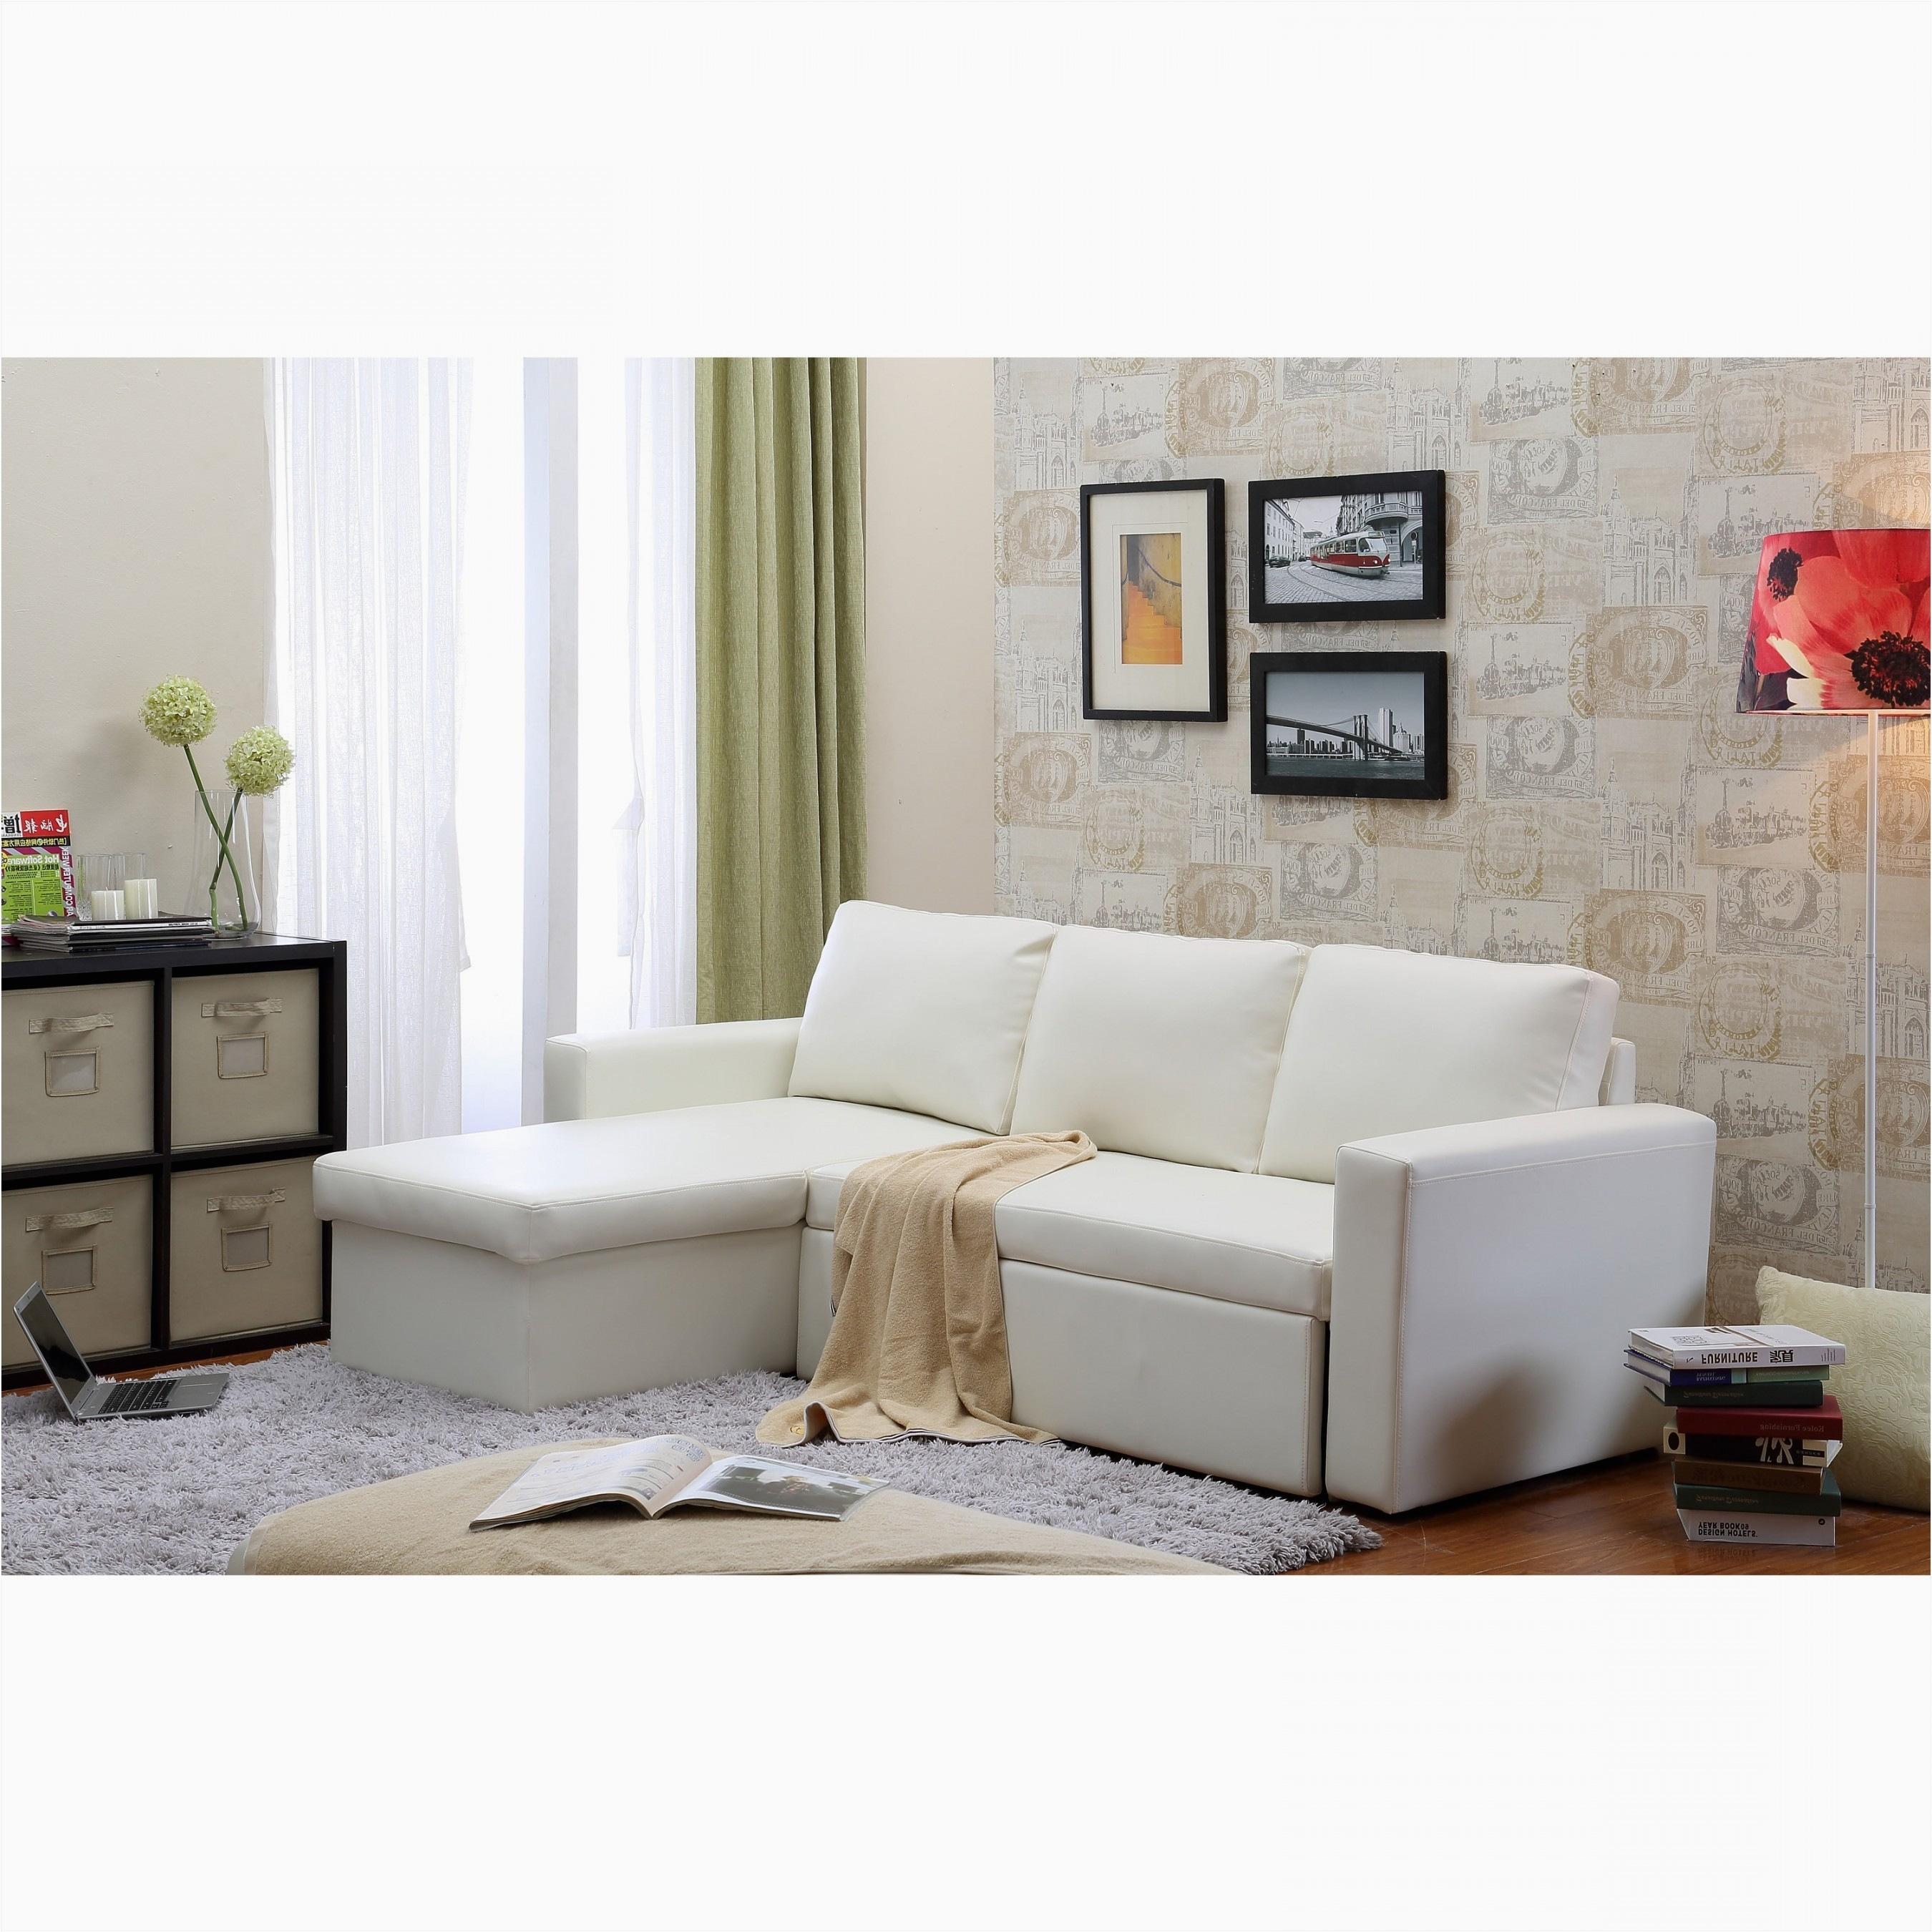 Jordan S Furniture Mattresses Kohls Living Room Furniture Inspirational New Jordan S Furniture